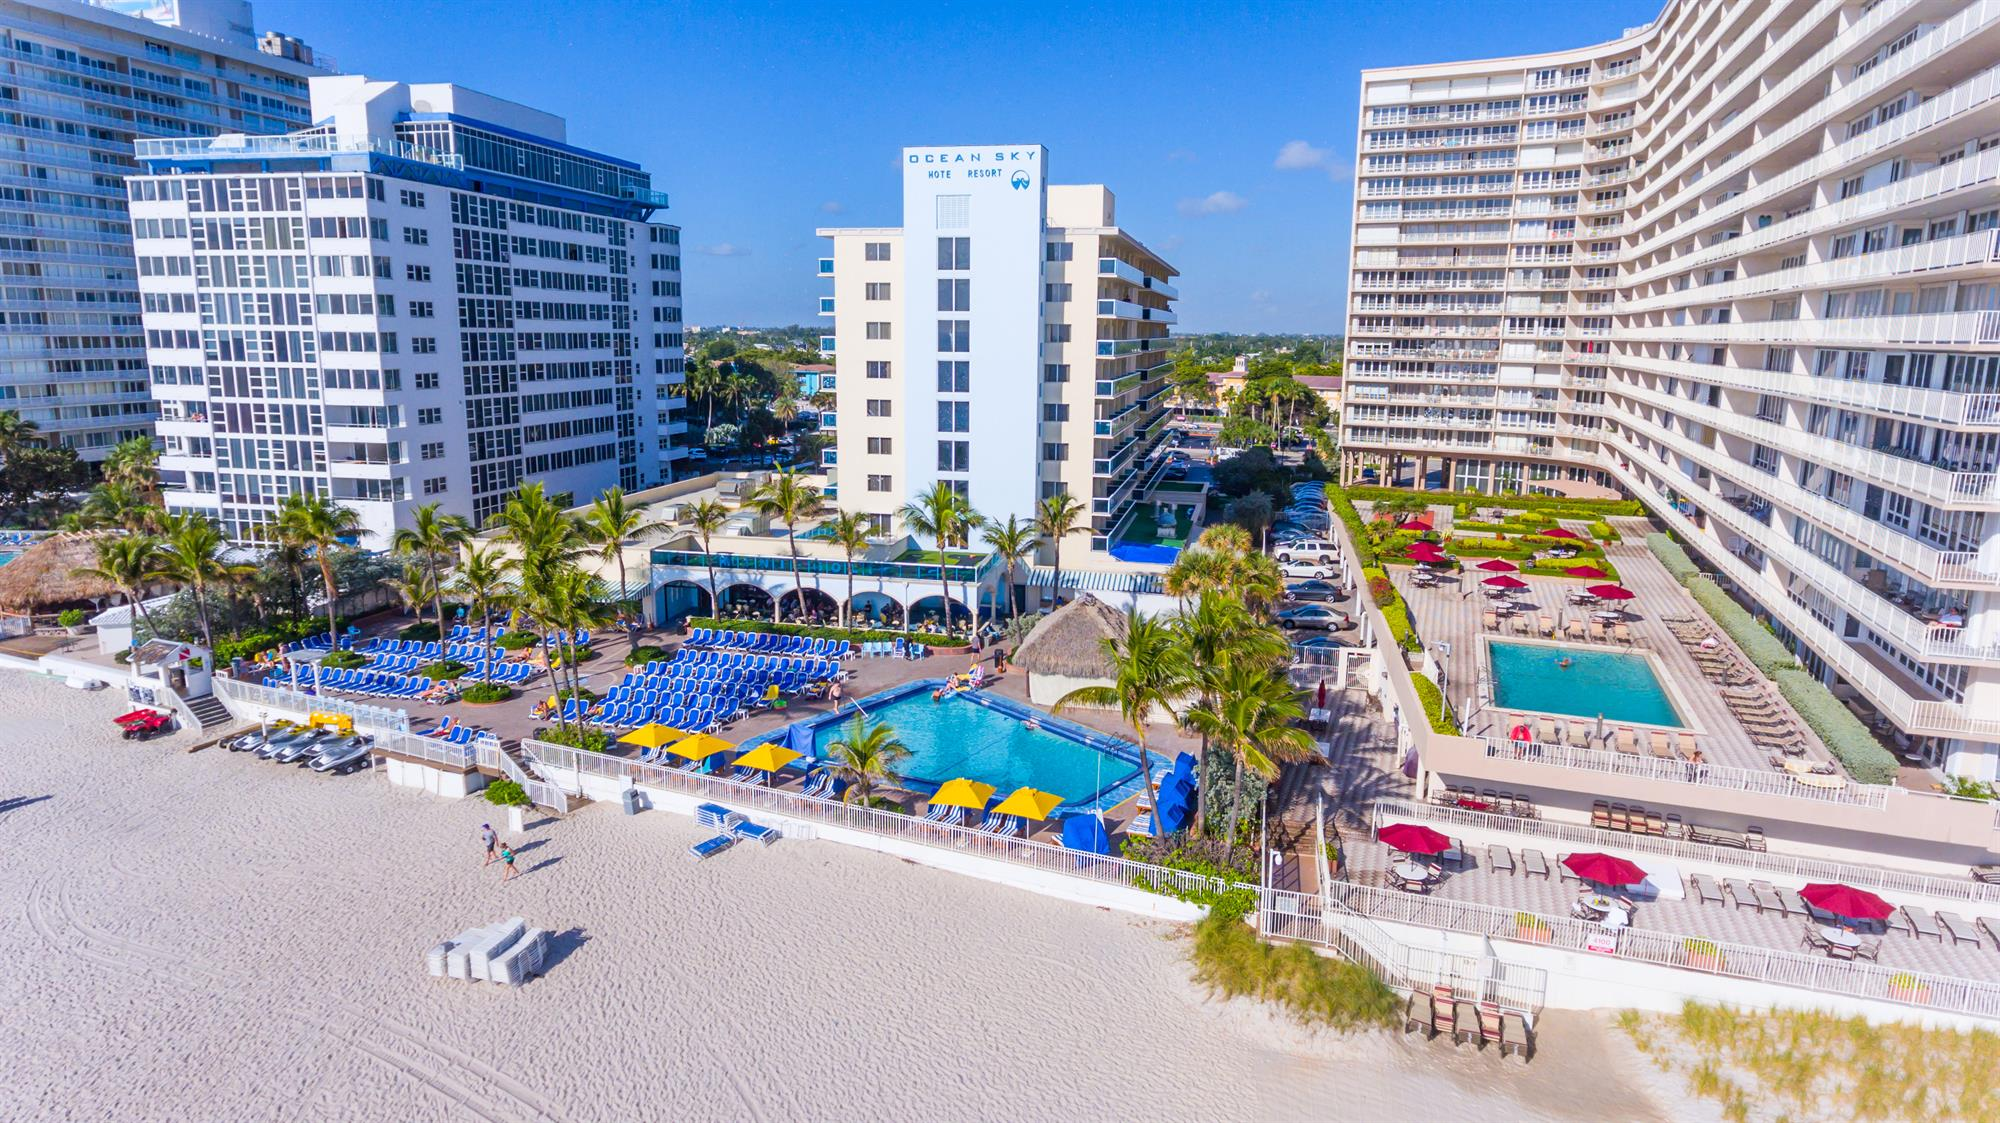 Ocean Sky Hotel-Pool Deck and Beach